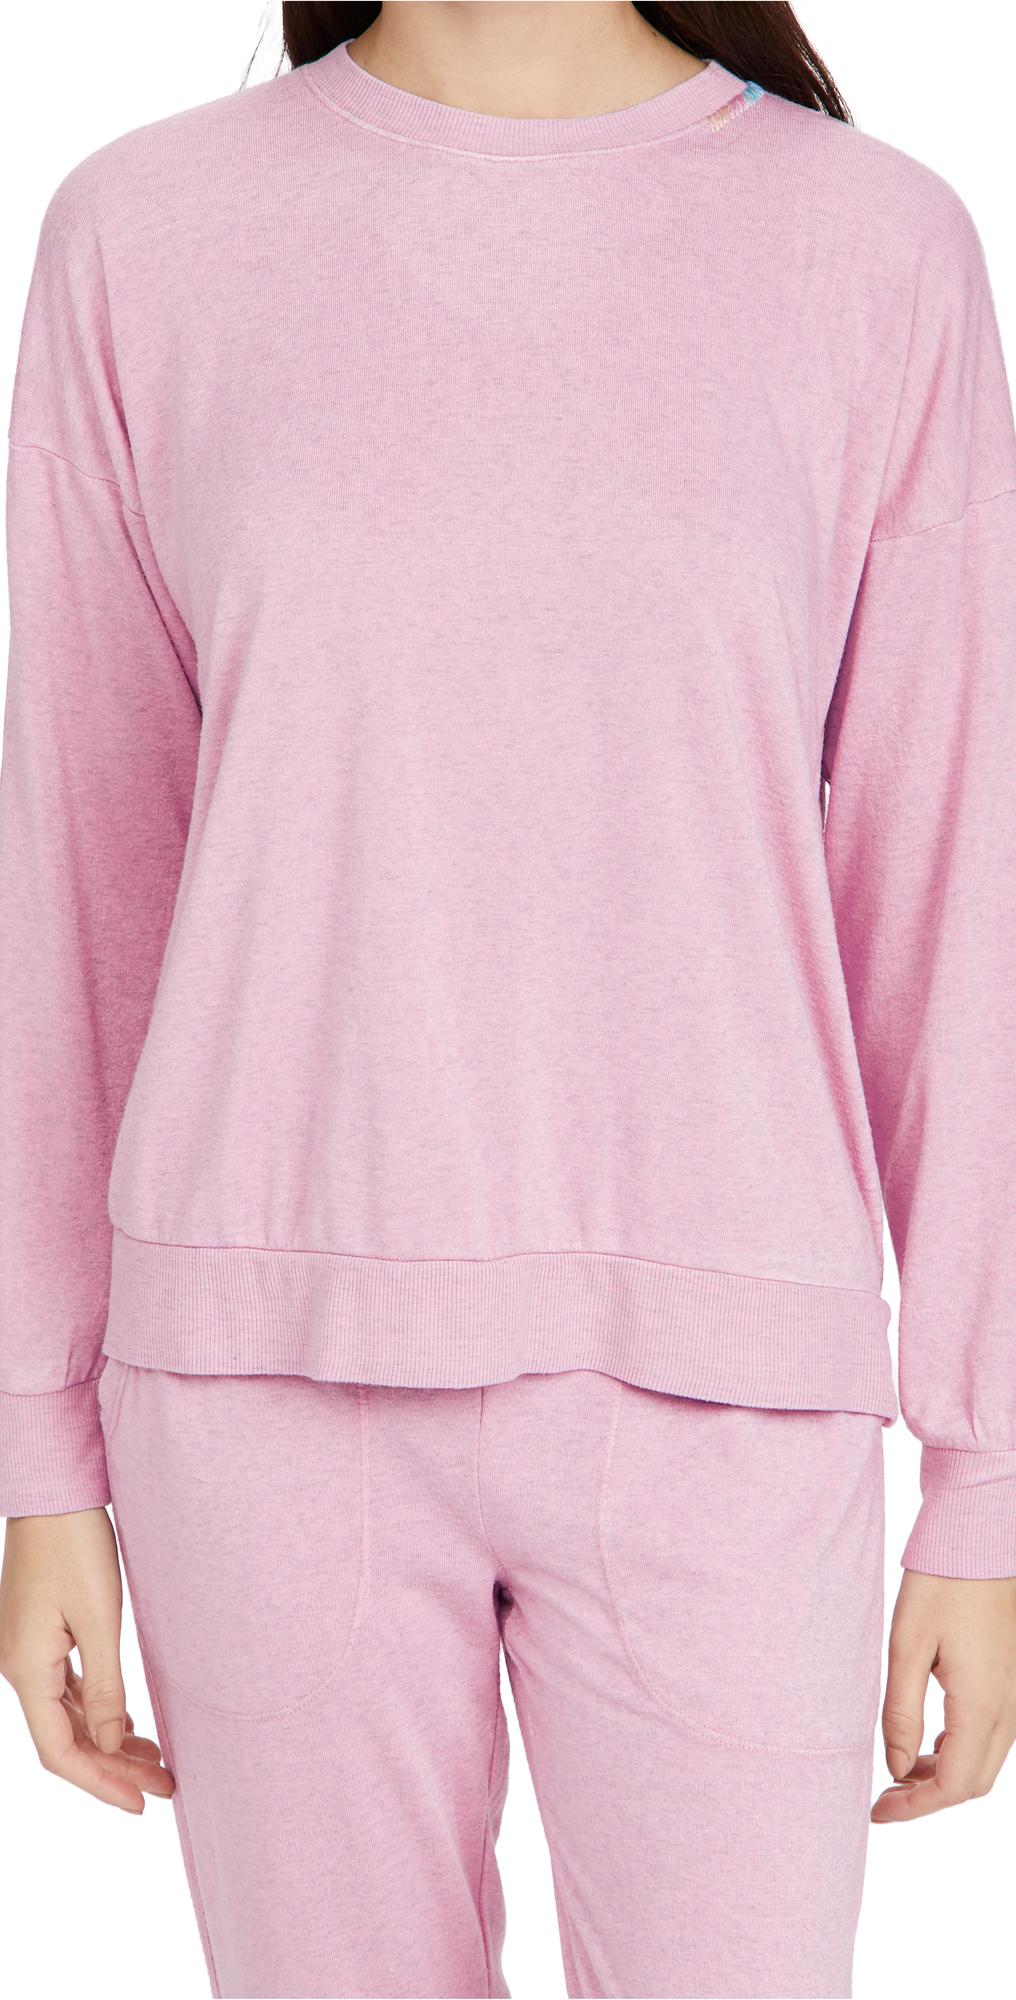 PJ Salvage Colorful Classic Pullover Sweatshirt